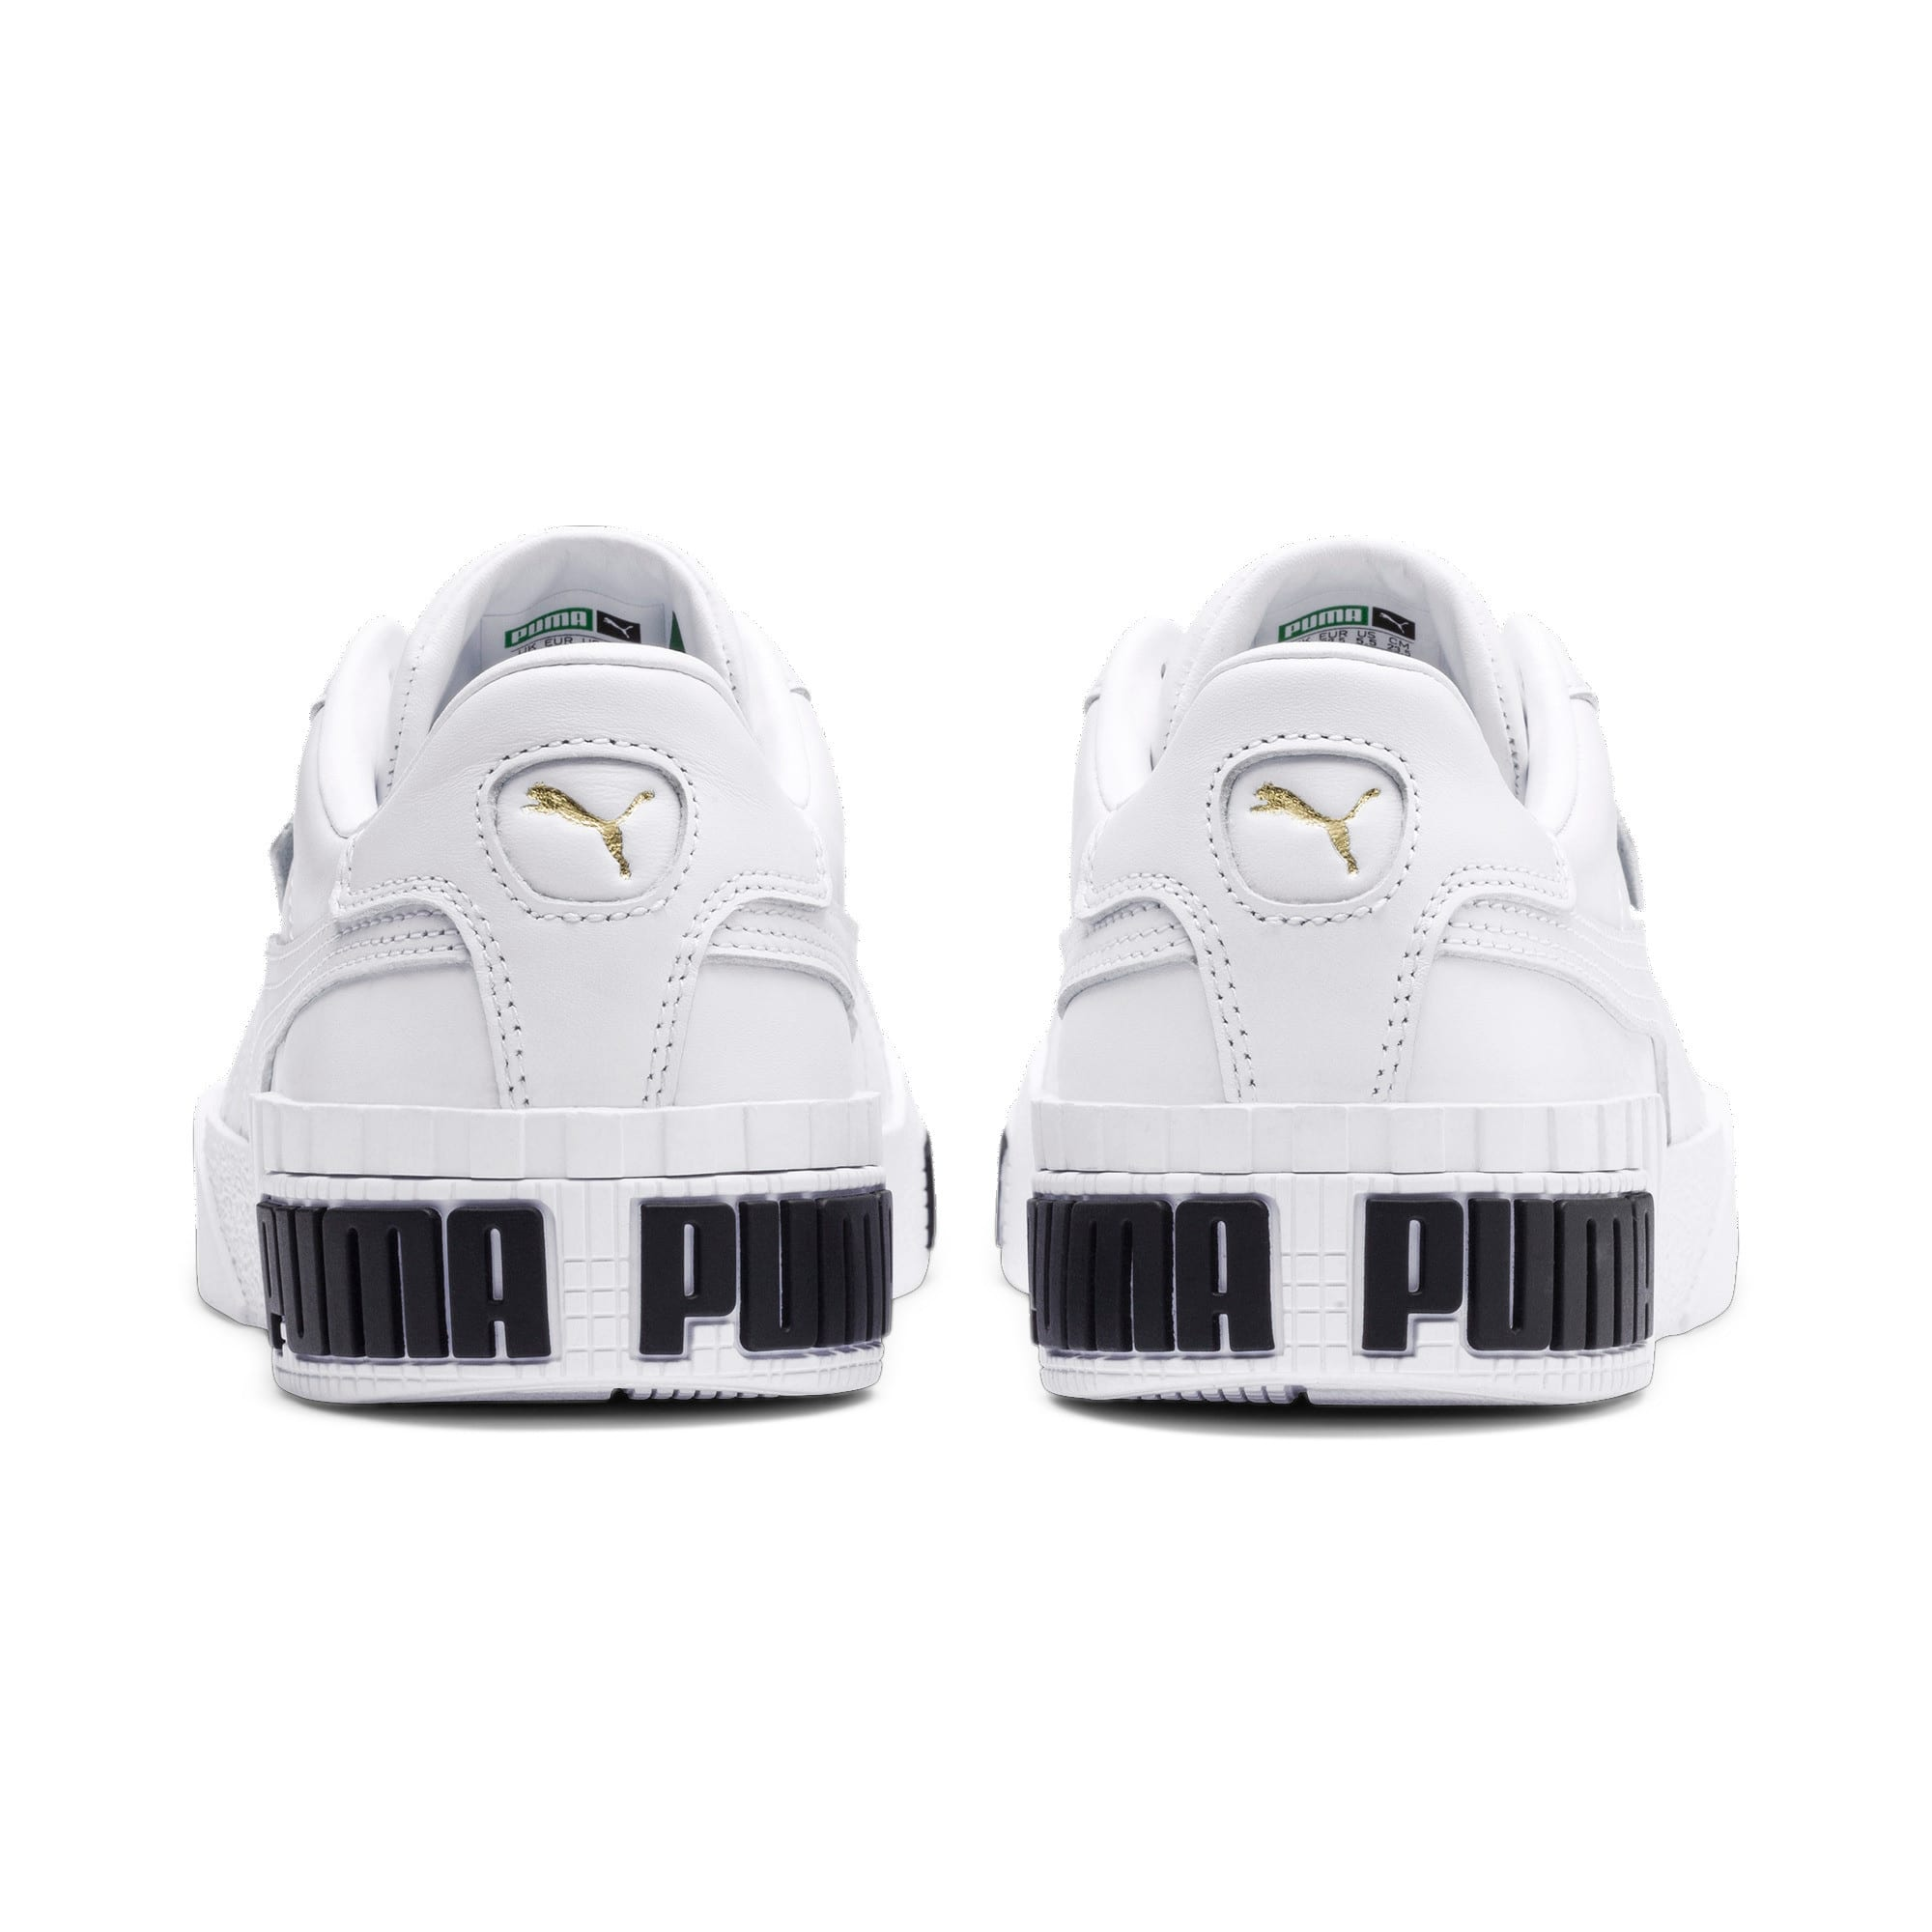 Thumbnail 4 of Cali Bold Women's Sneakers, Puma White-Metallic Gold, medium